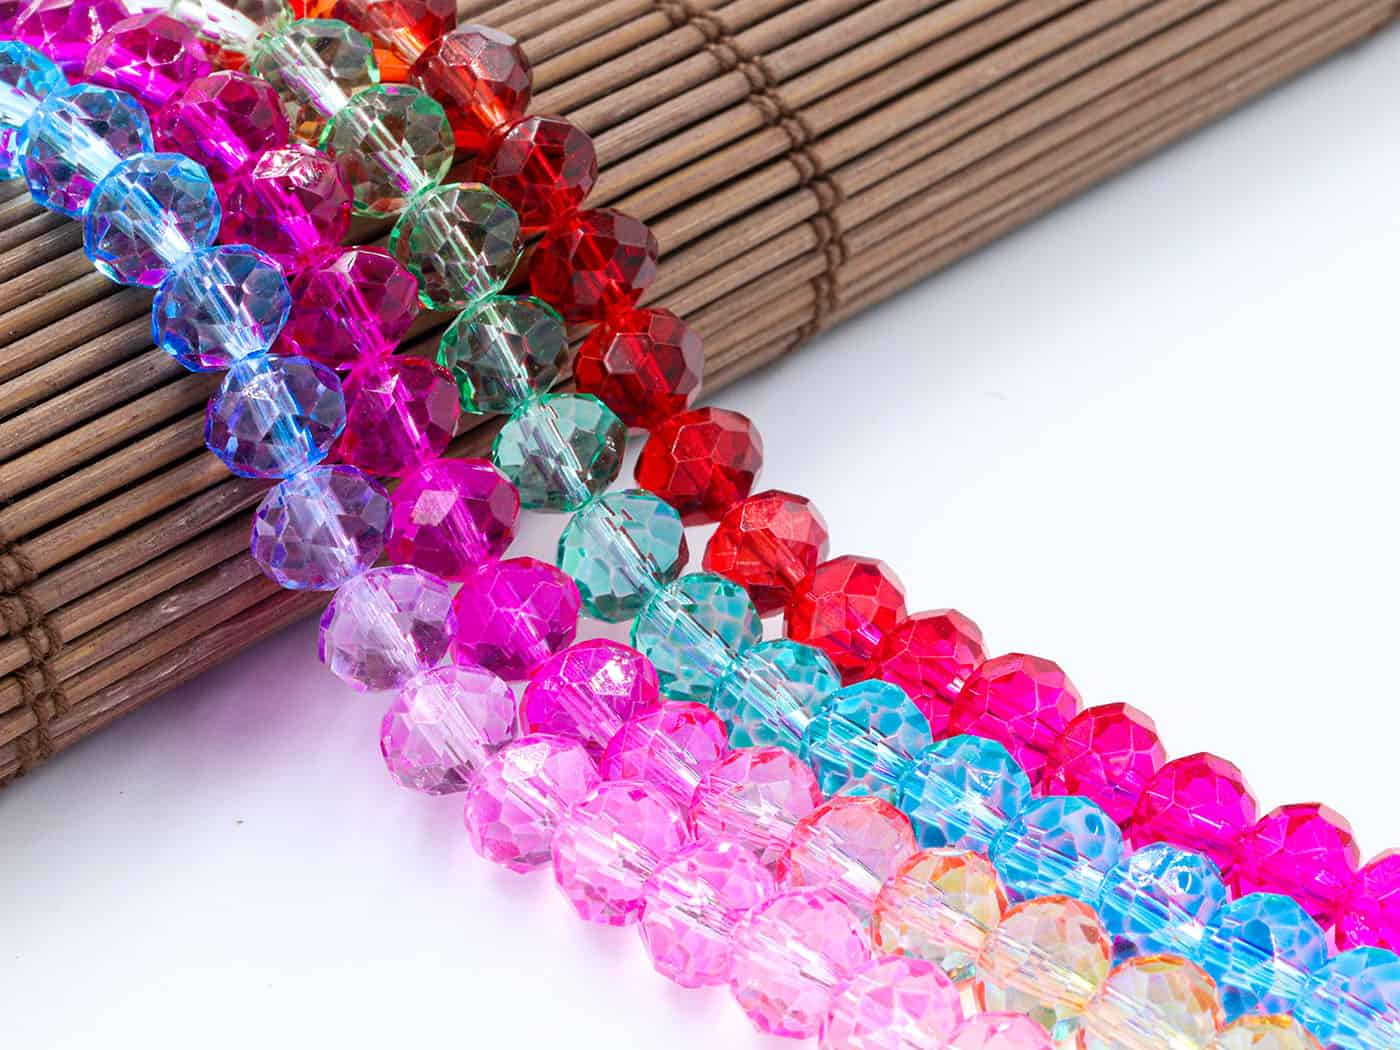 Cristal de Vidro Tie Dye Soft 8mm - 60 cristais - CV514  - ArtStones